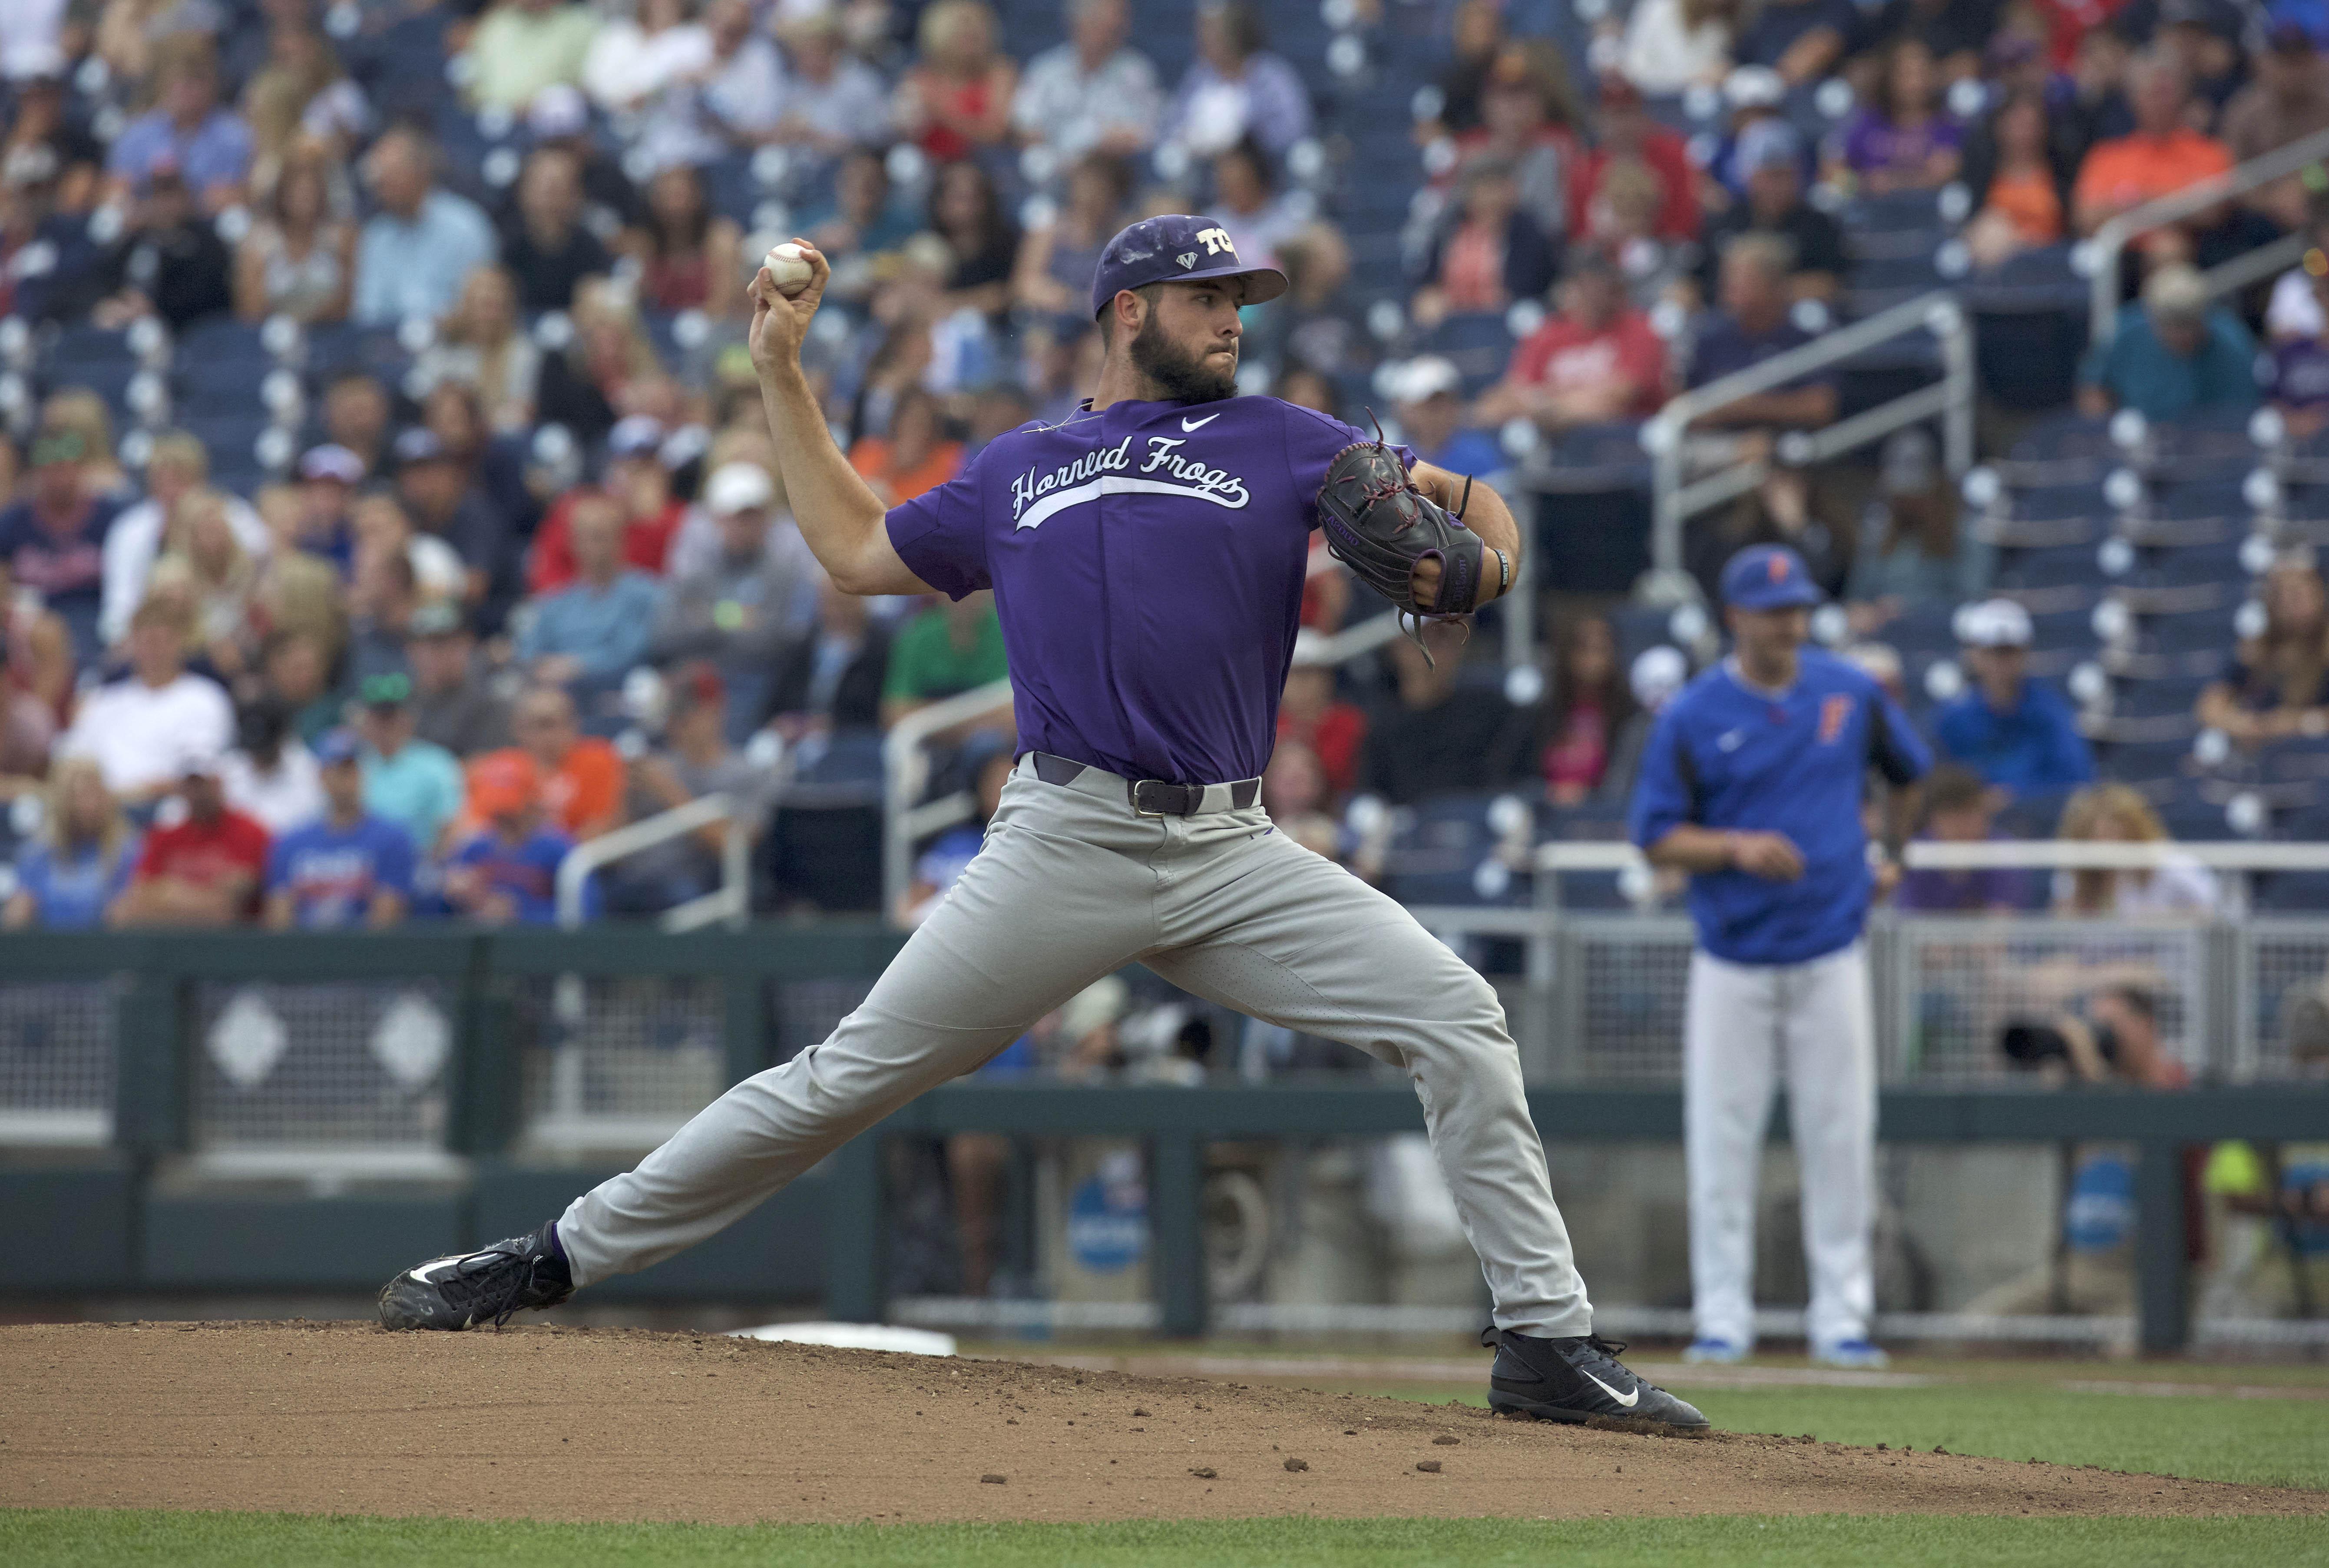 10127573-ncaa-baseball-college-world-series-florida-vs-tcu